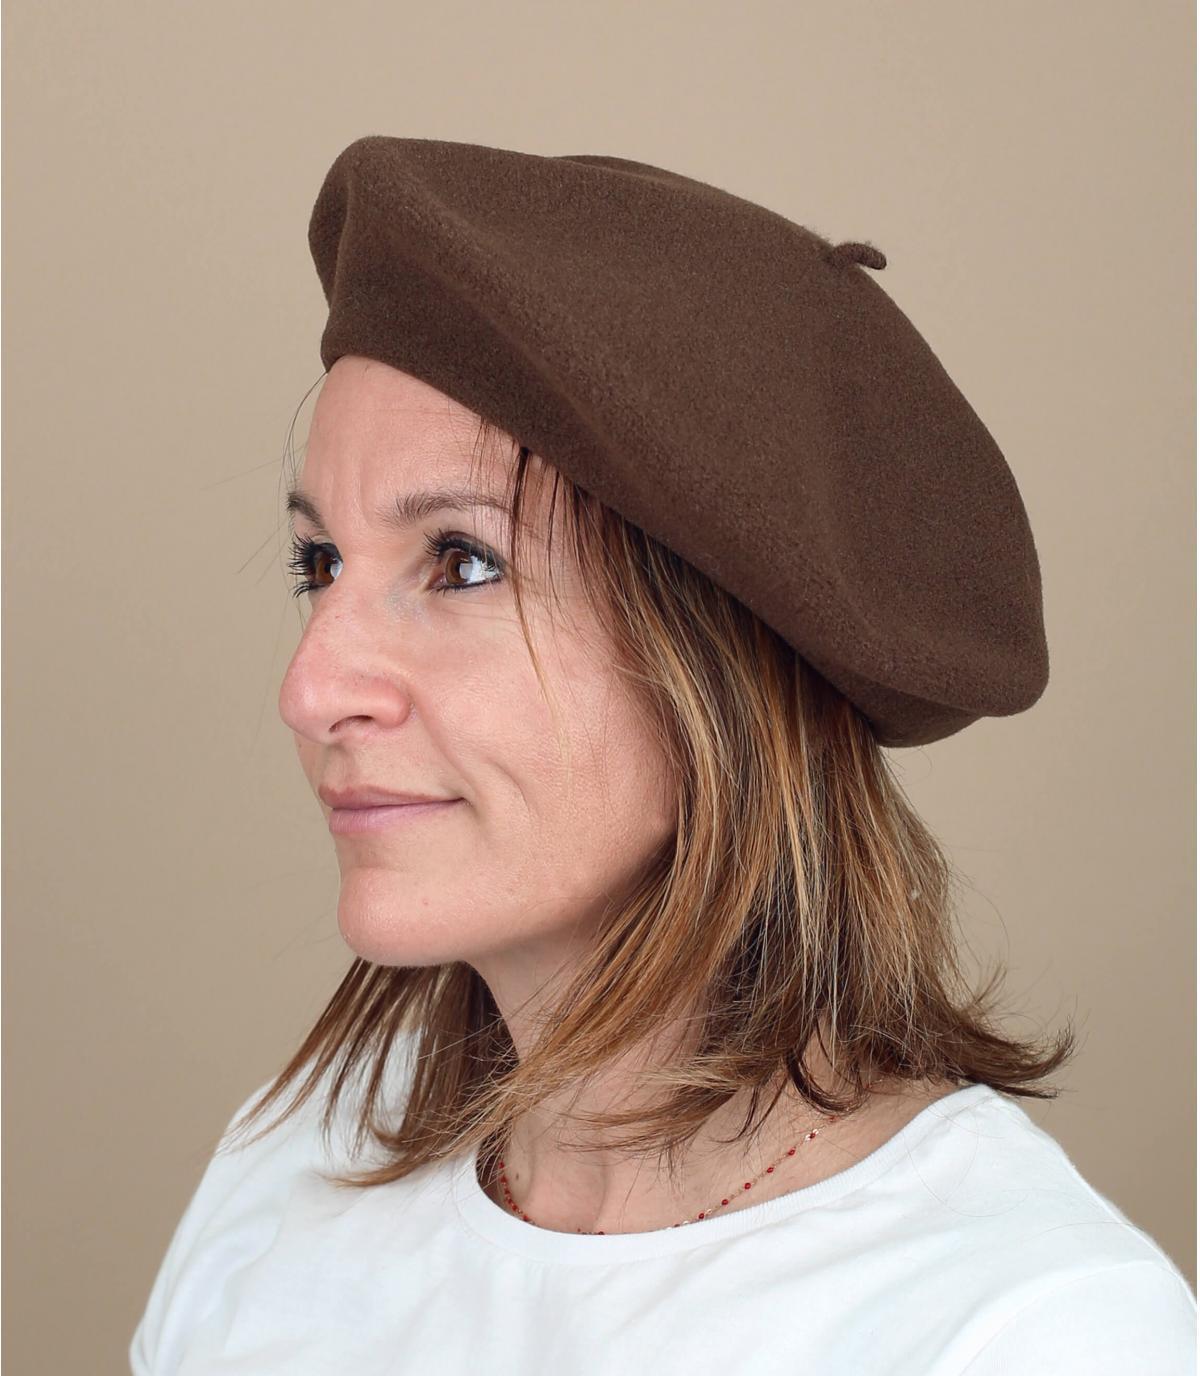 Laulhère bruine baret